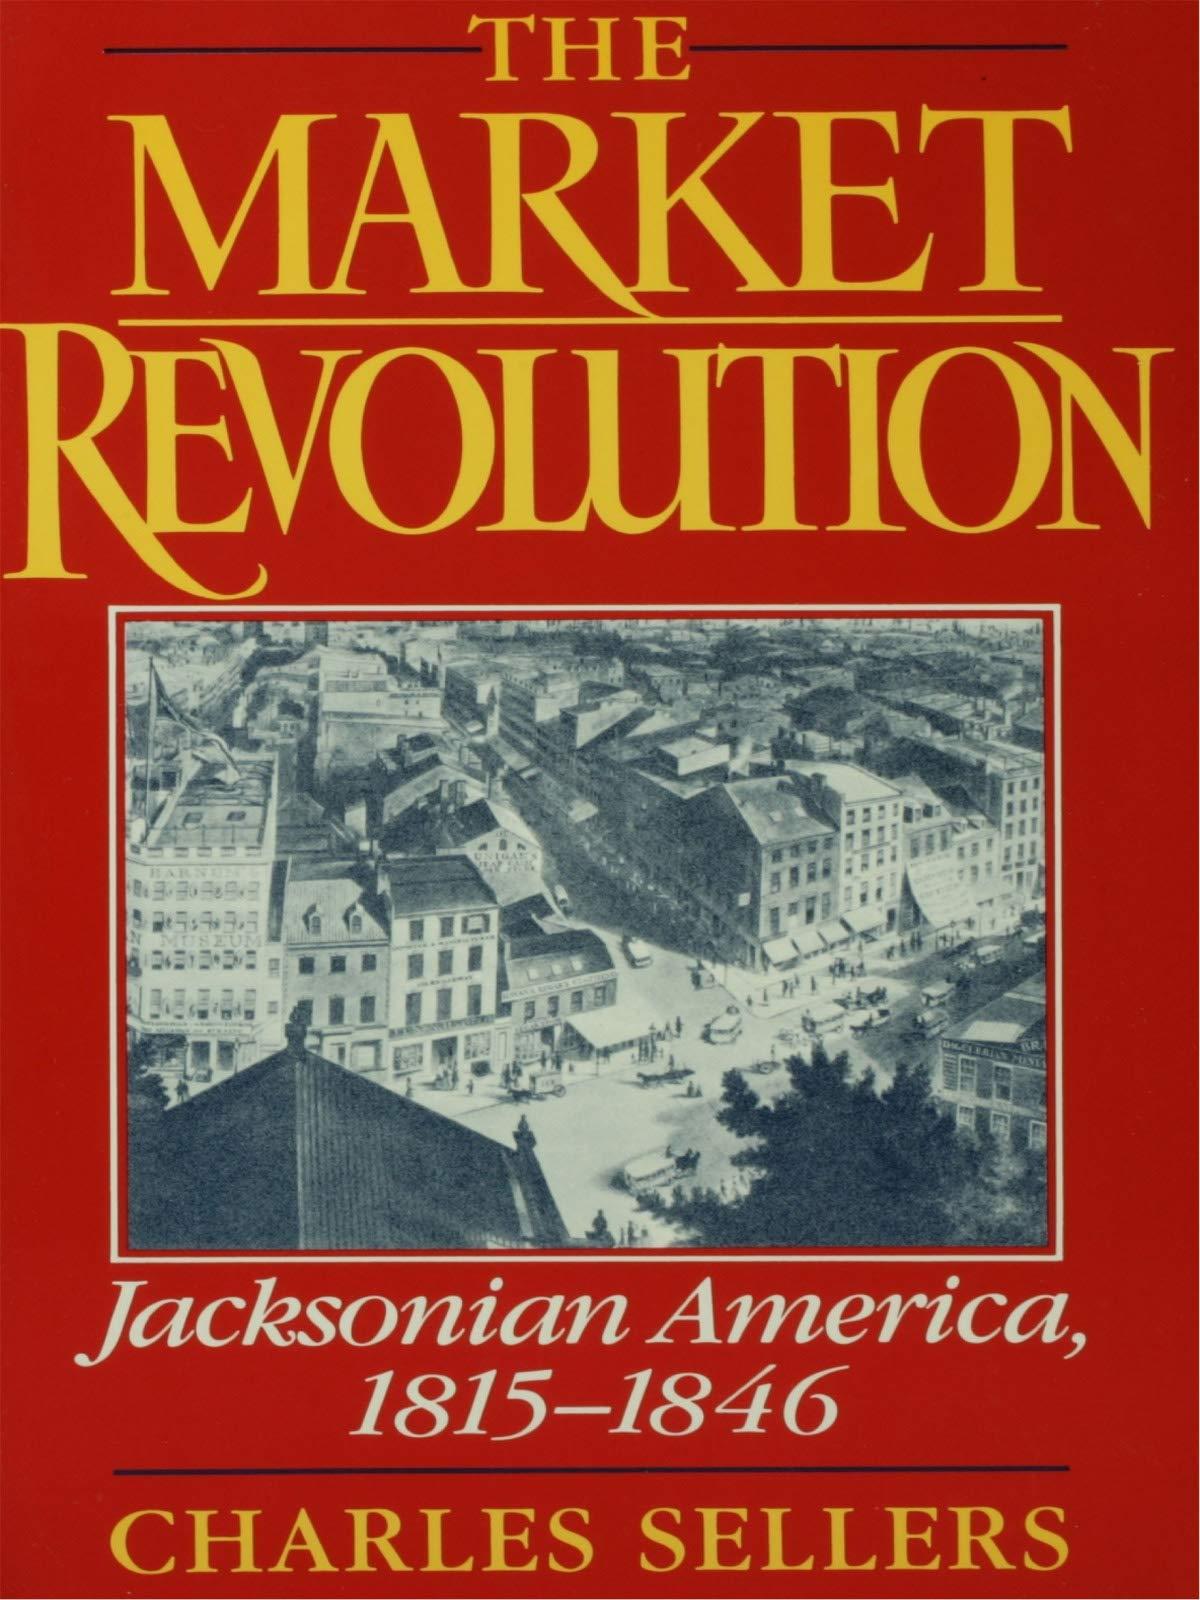 The Market Revolution: Jacksonian America, 1815-1846